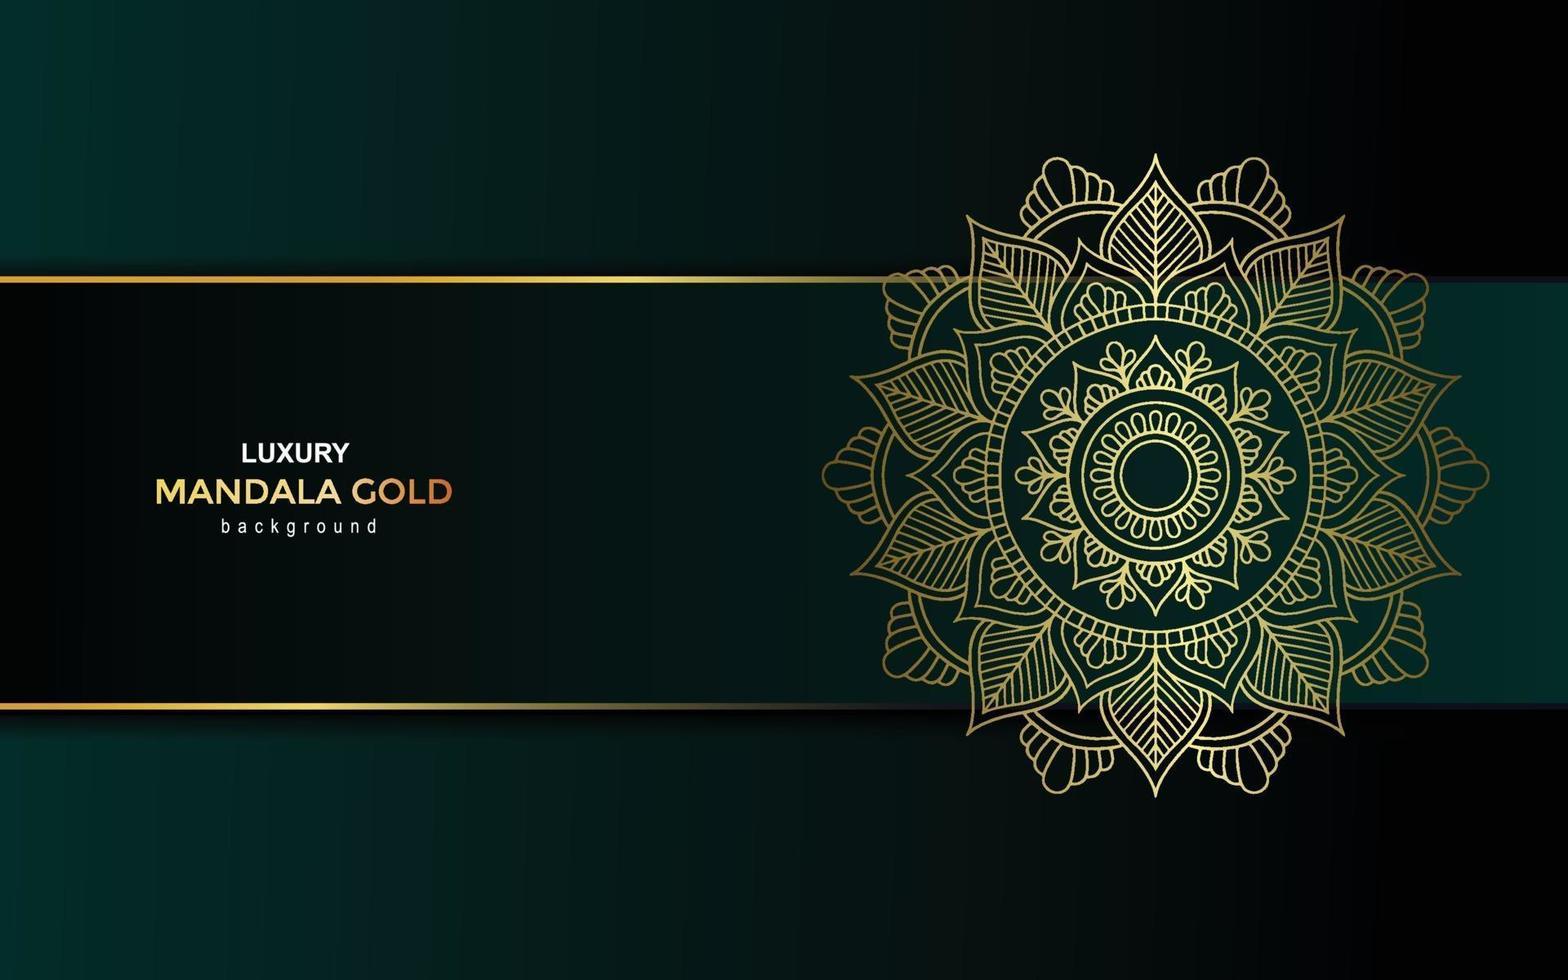 Luxury gold mandala ornate background for wedding invitation, book cover vector